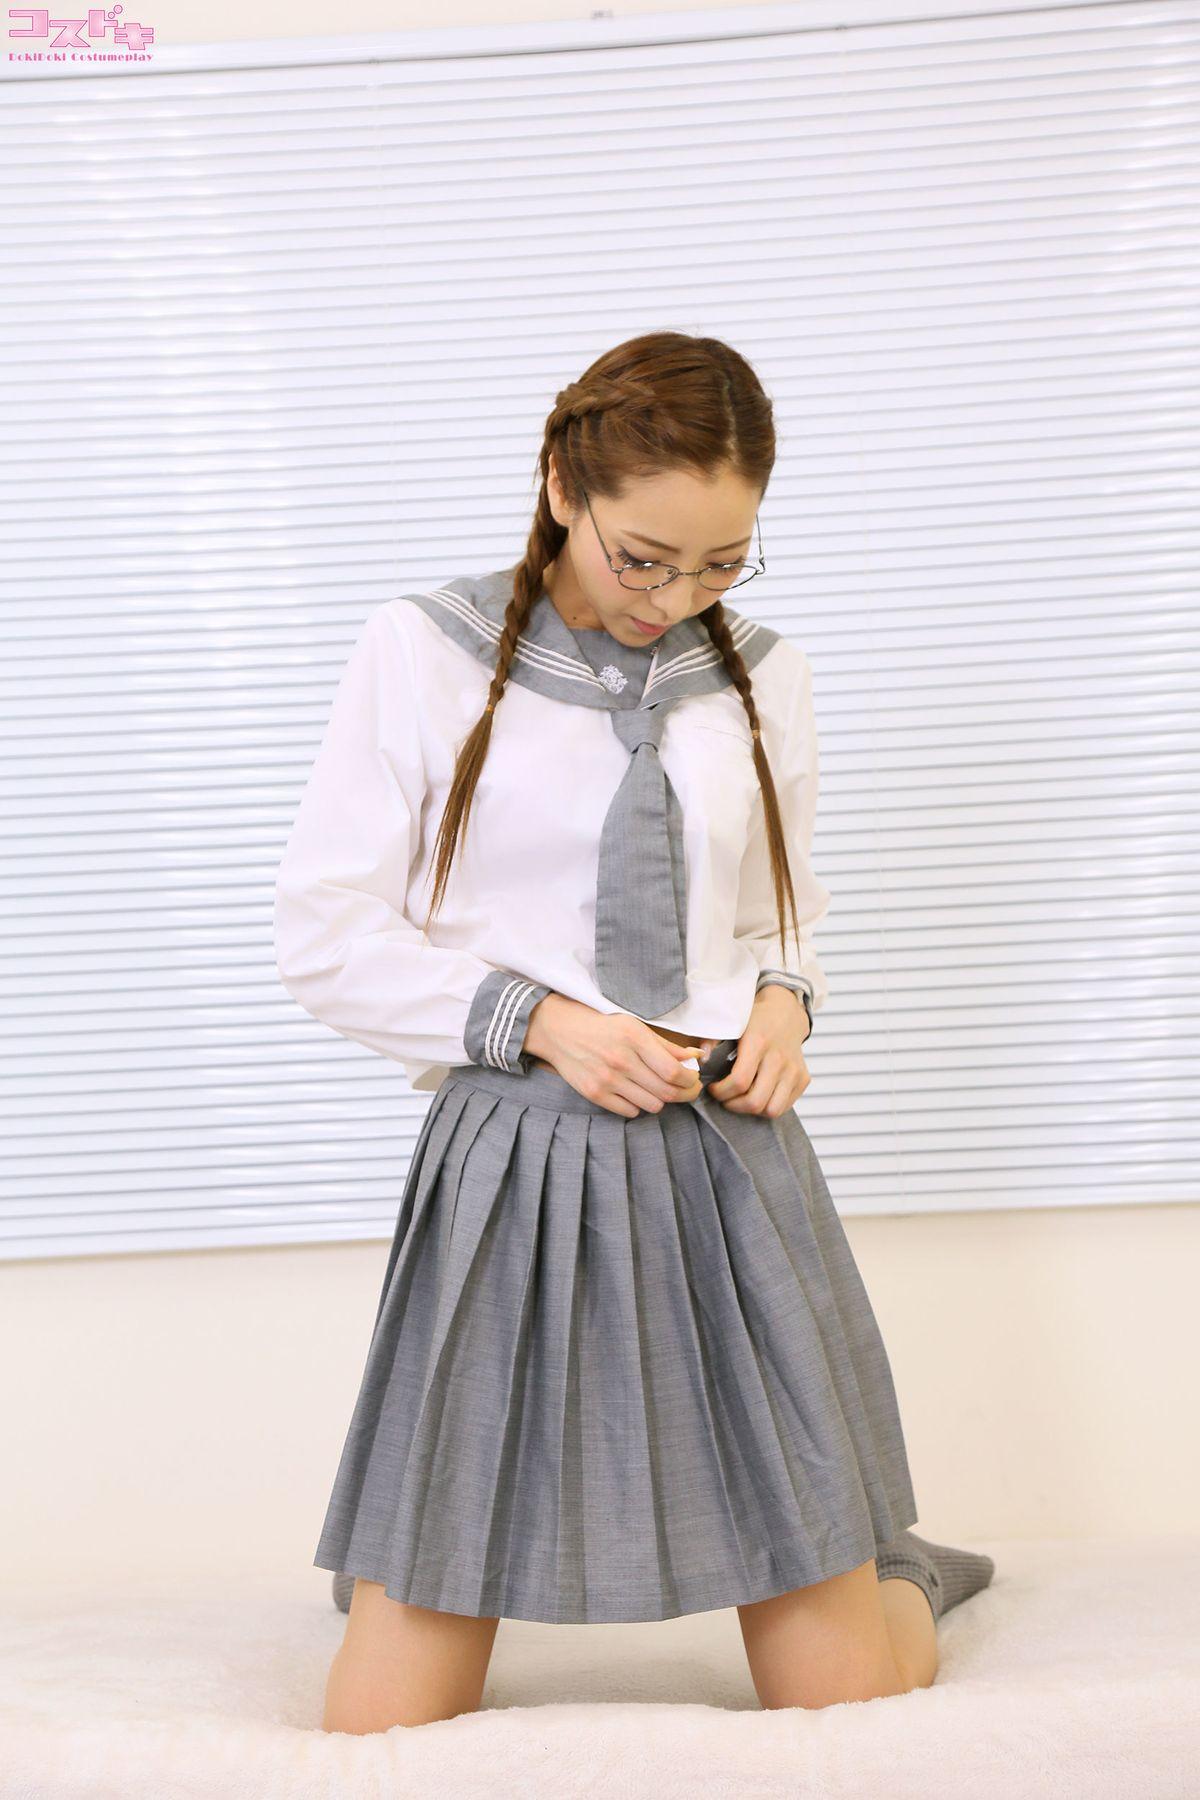 [Cosdoki] 天木ゆう(輝月あんり) kidukianri_pic_sailor1 寫真集(26) -美女 ...